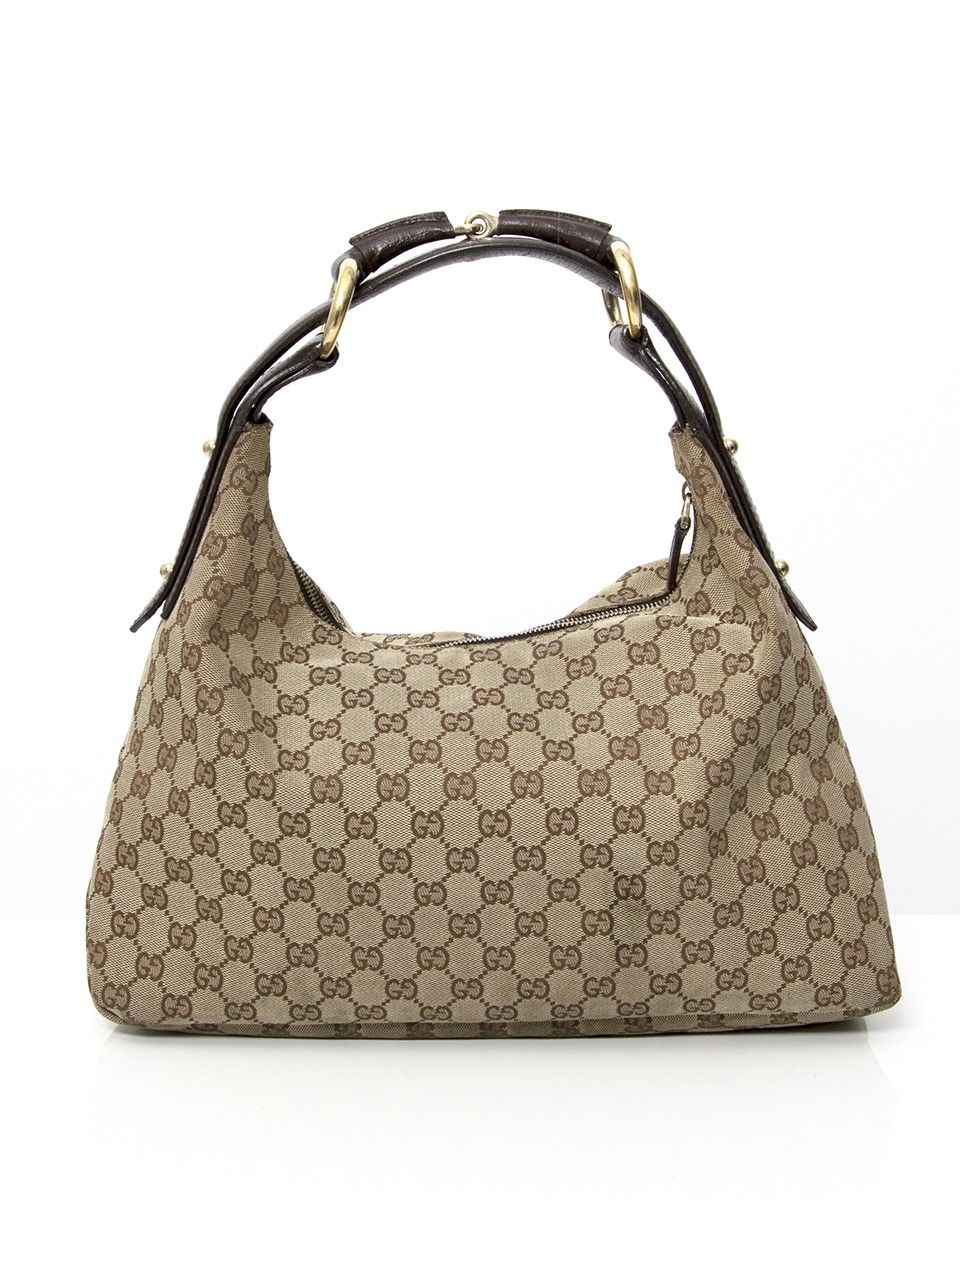 99cc30fc174 Gucci Monogram Hobo Bag